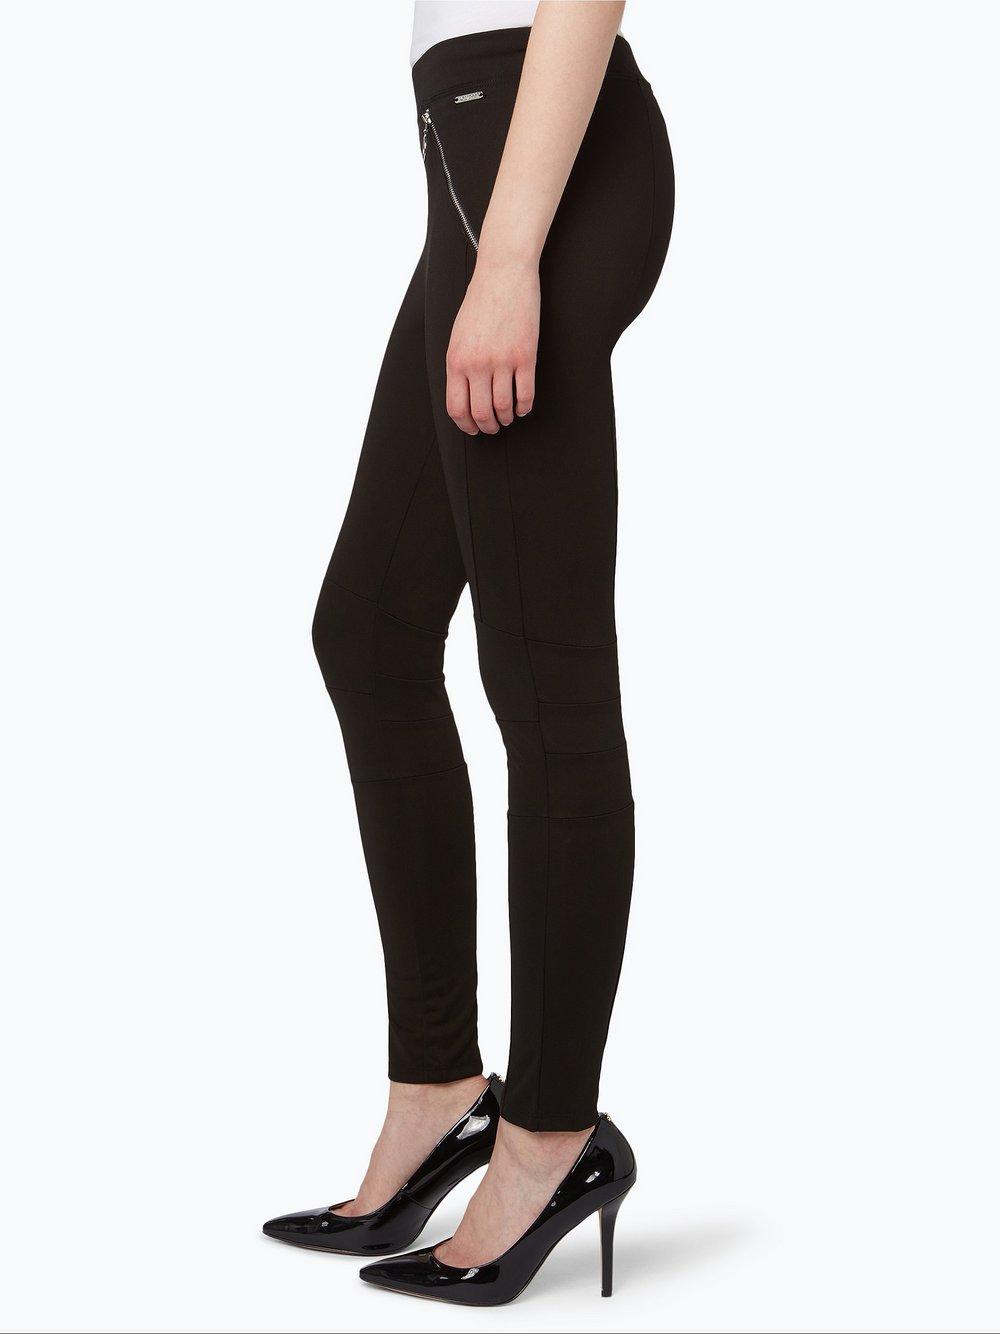 GUESS Damen Leggings online kaufen | VANGRAAF.COM